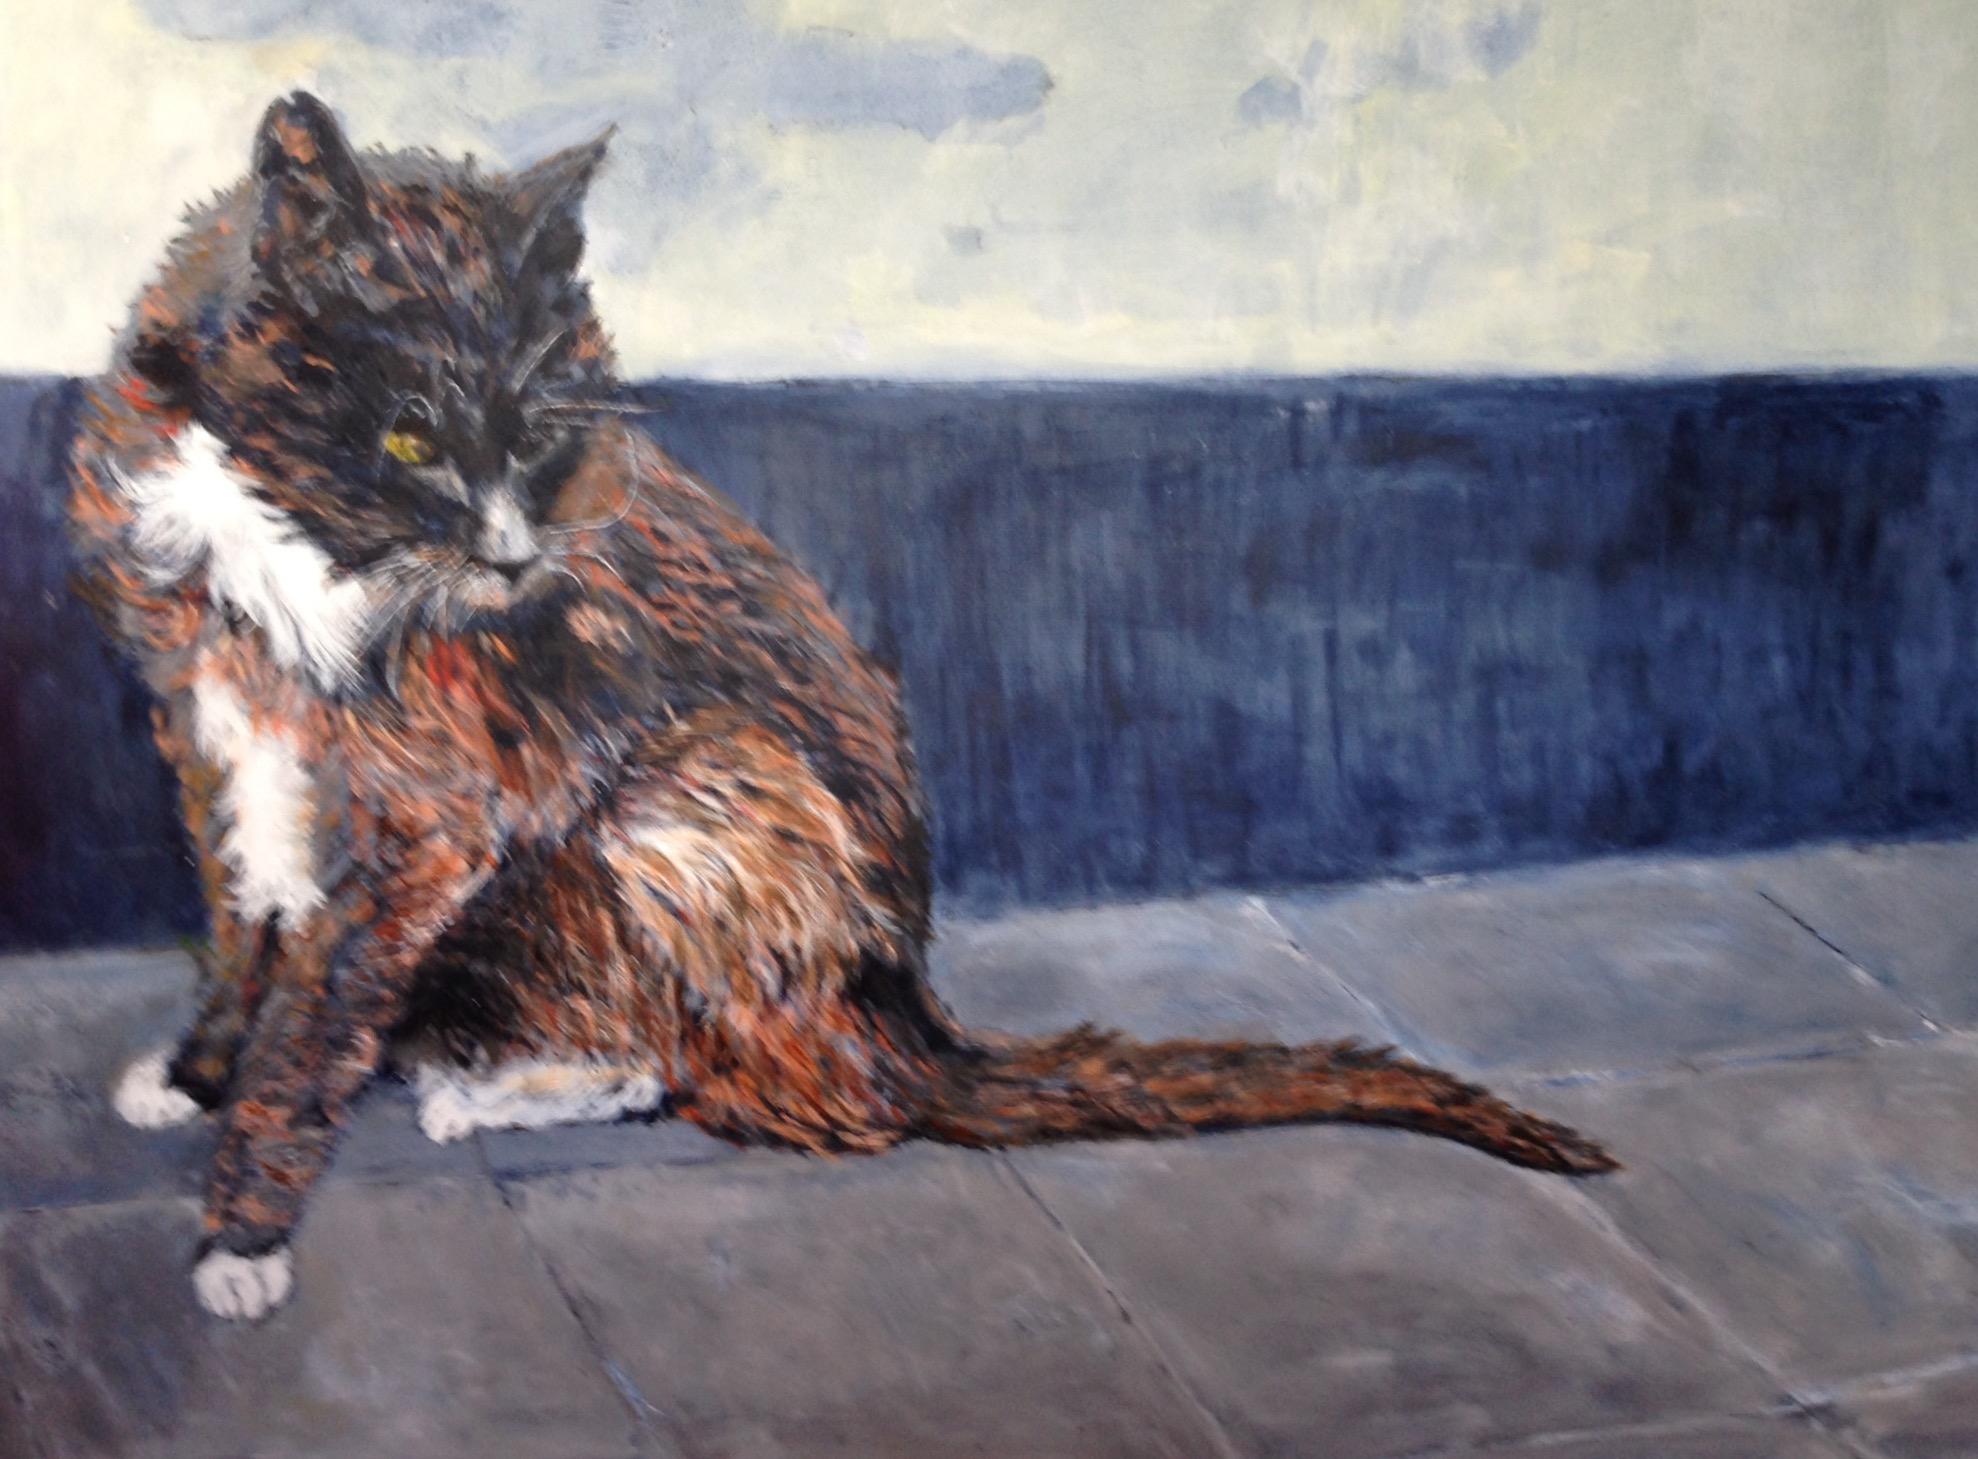 Katten Gustav 19 år er et maleri der er en meter højt og 1,5 meter bredt. Det er akryl på lærred